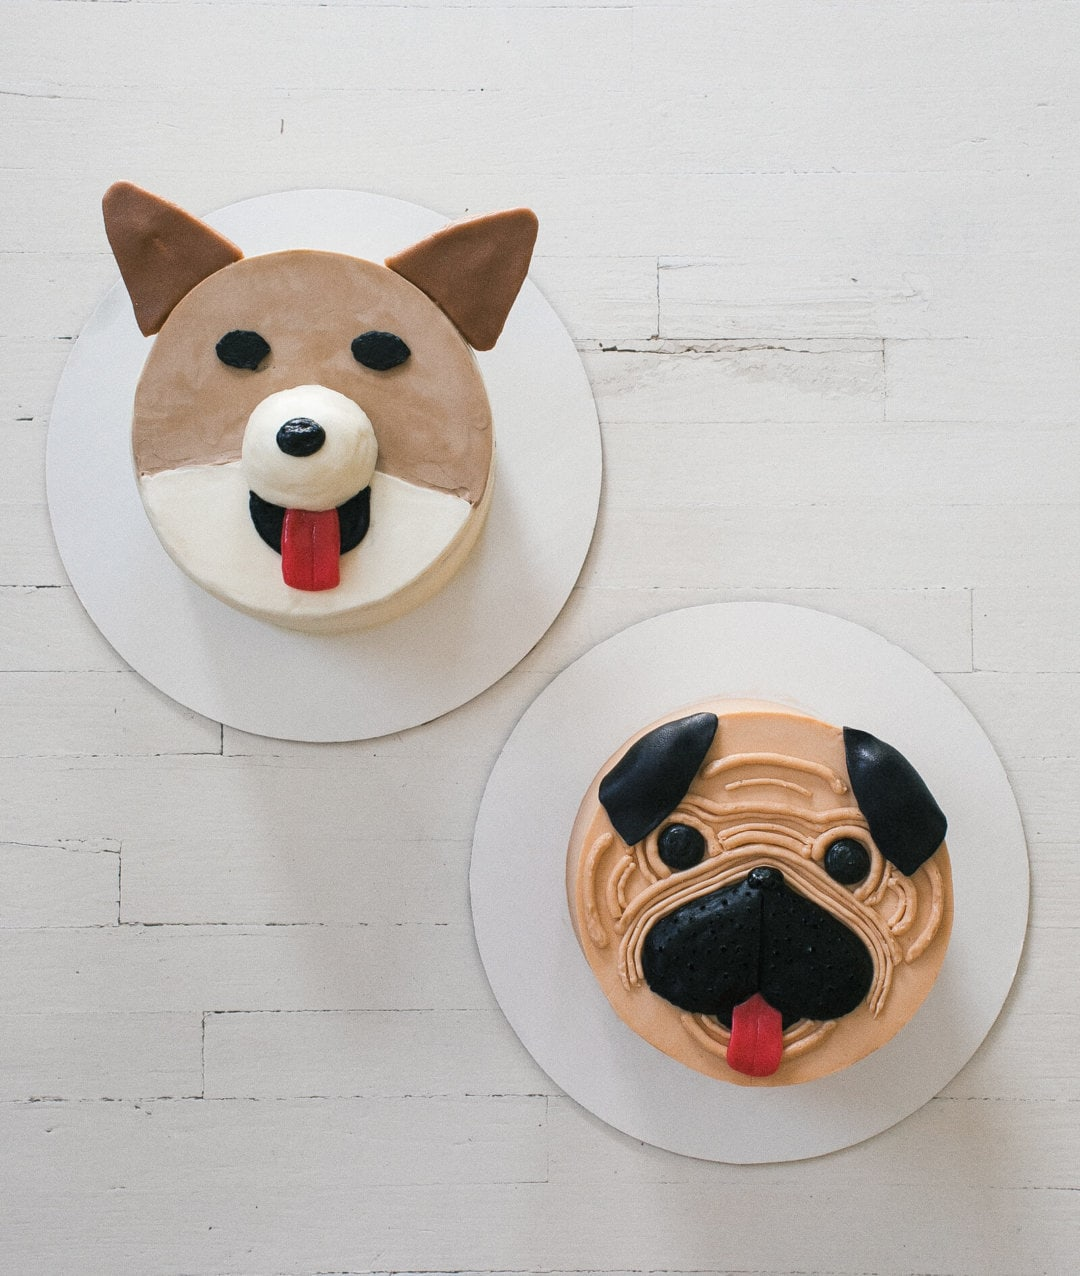 Phenomenal How To Make A Corgi Cake And A Pug Cake Too A Cozy Kitchen Funny Birthday Cards Online Bapapcheapnameinfo